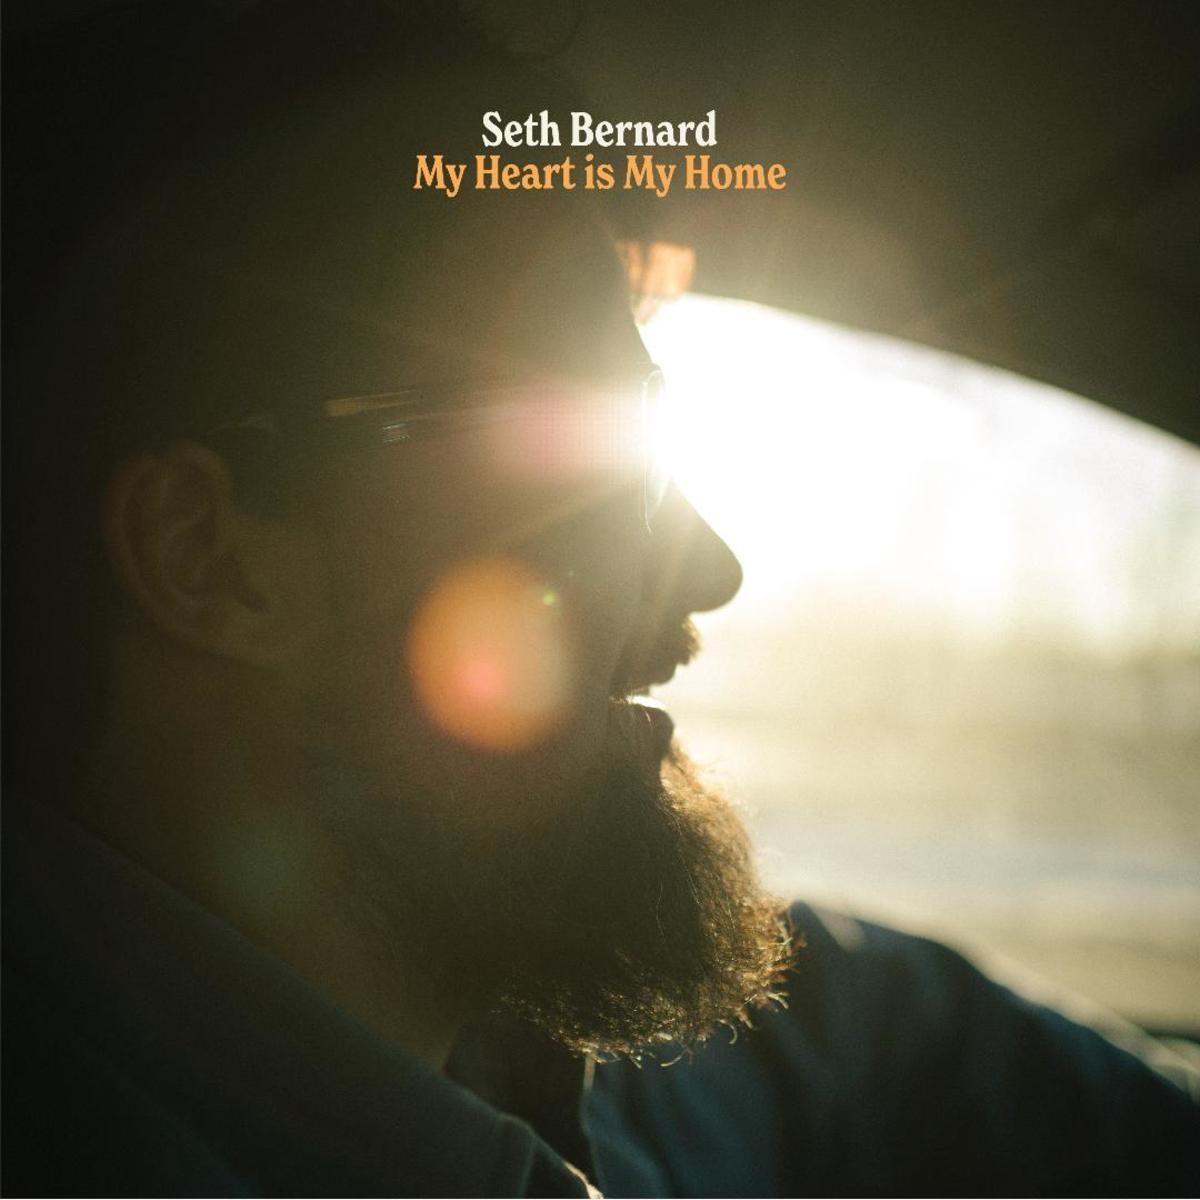 Seth Bernard